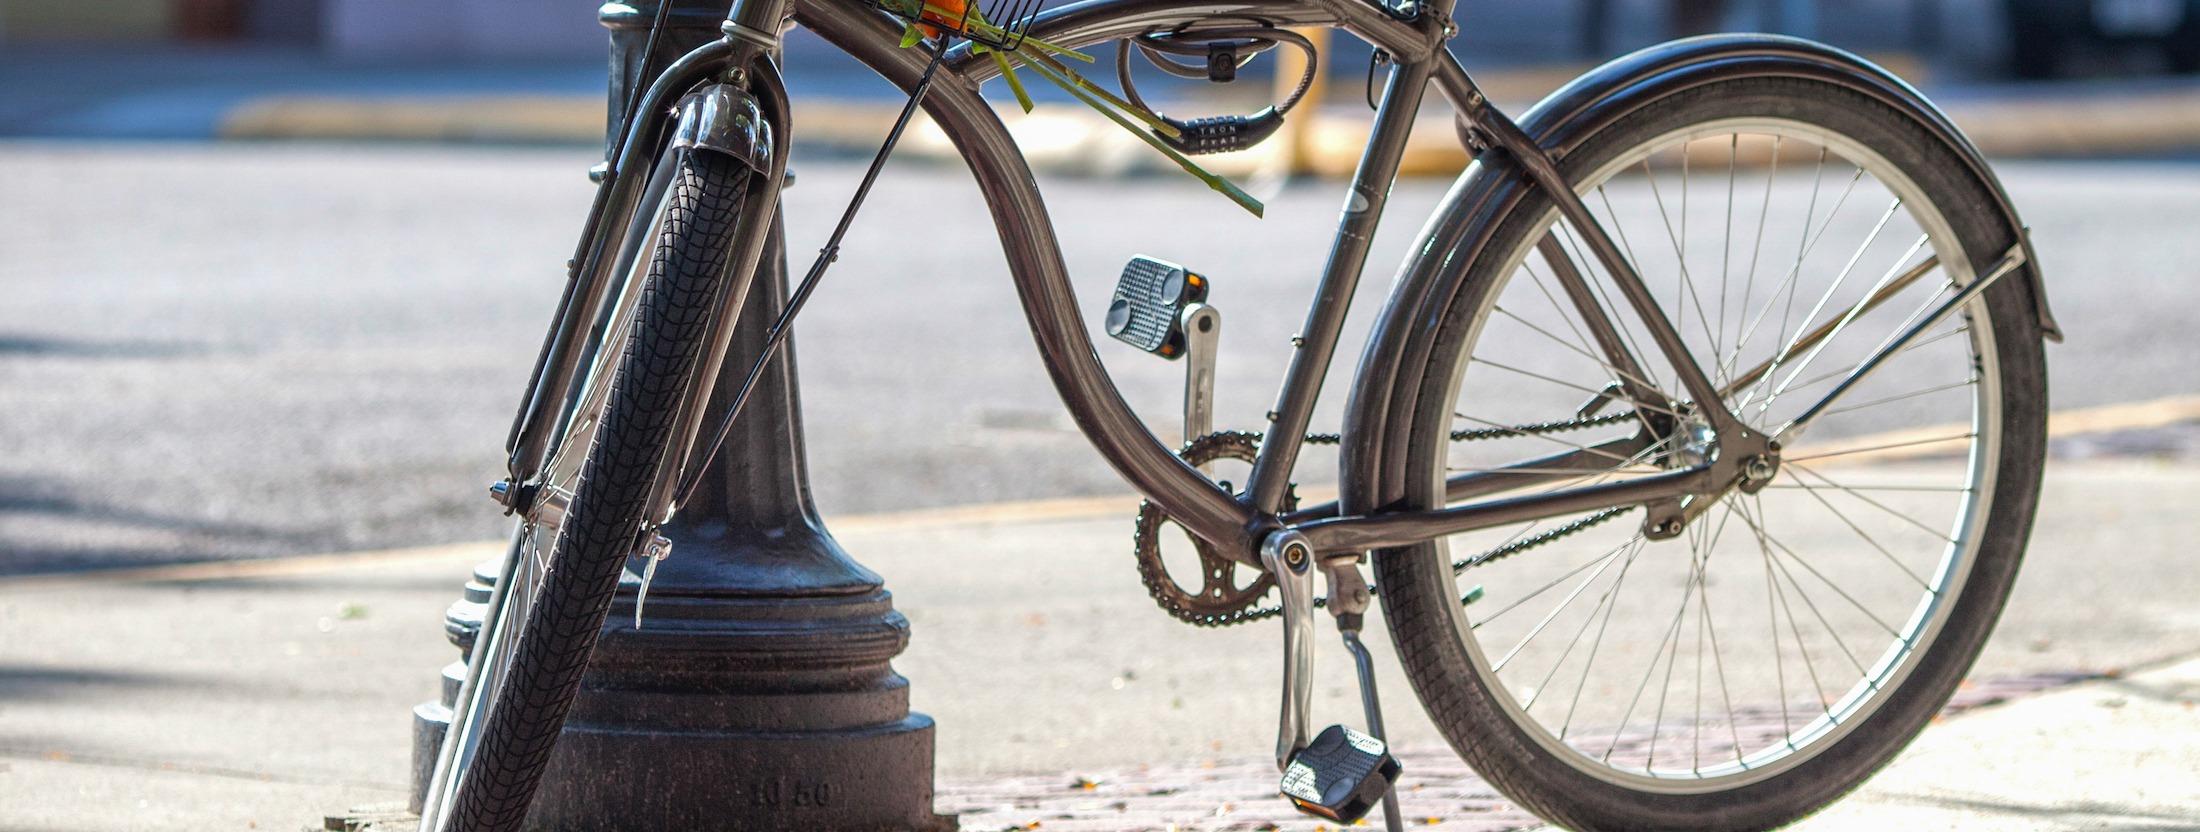 Top 5 U.S. Cities for Biking - Missoula, Montana